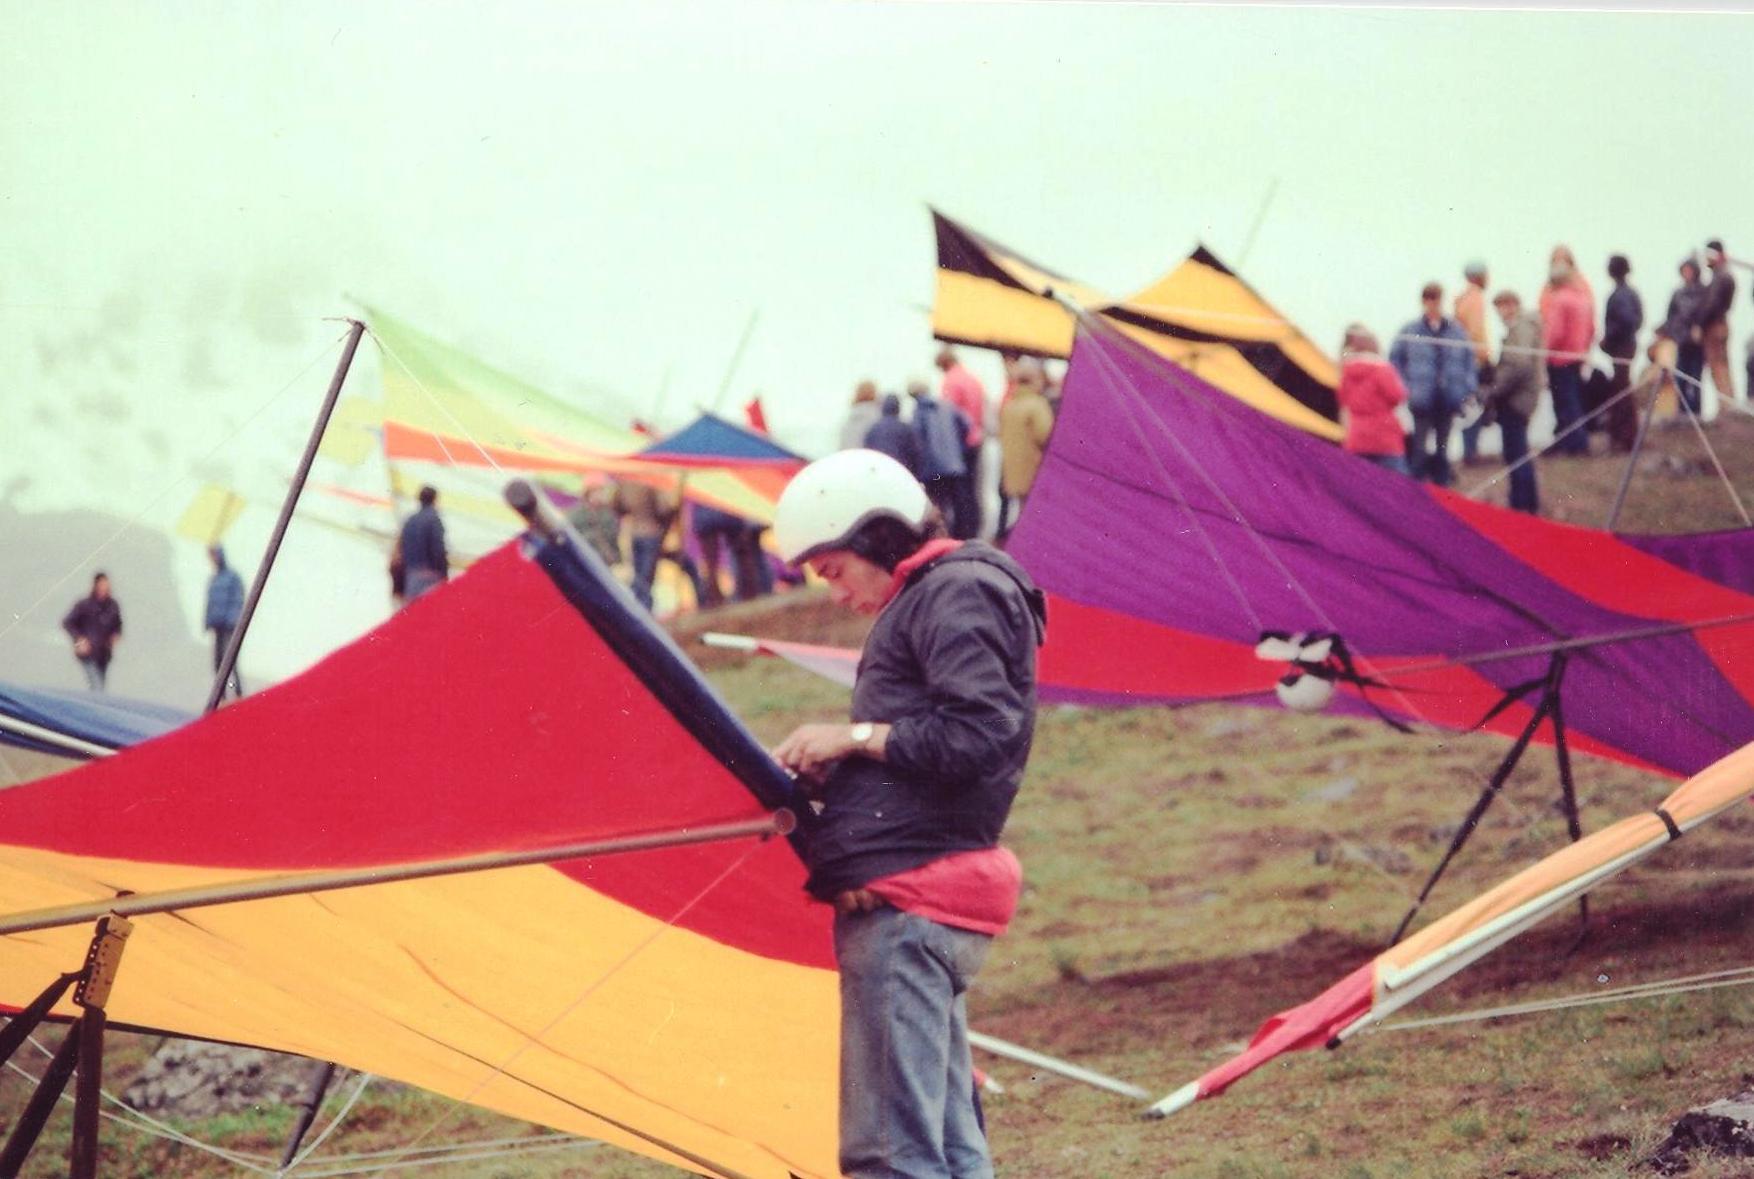 bill-sheka-hatchers-pass-july-3-1975-tightening-leading-edge-wingnut-seagull3